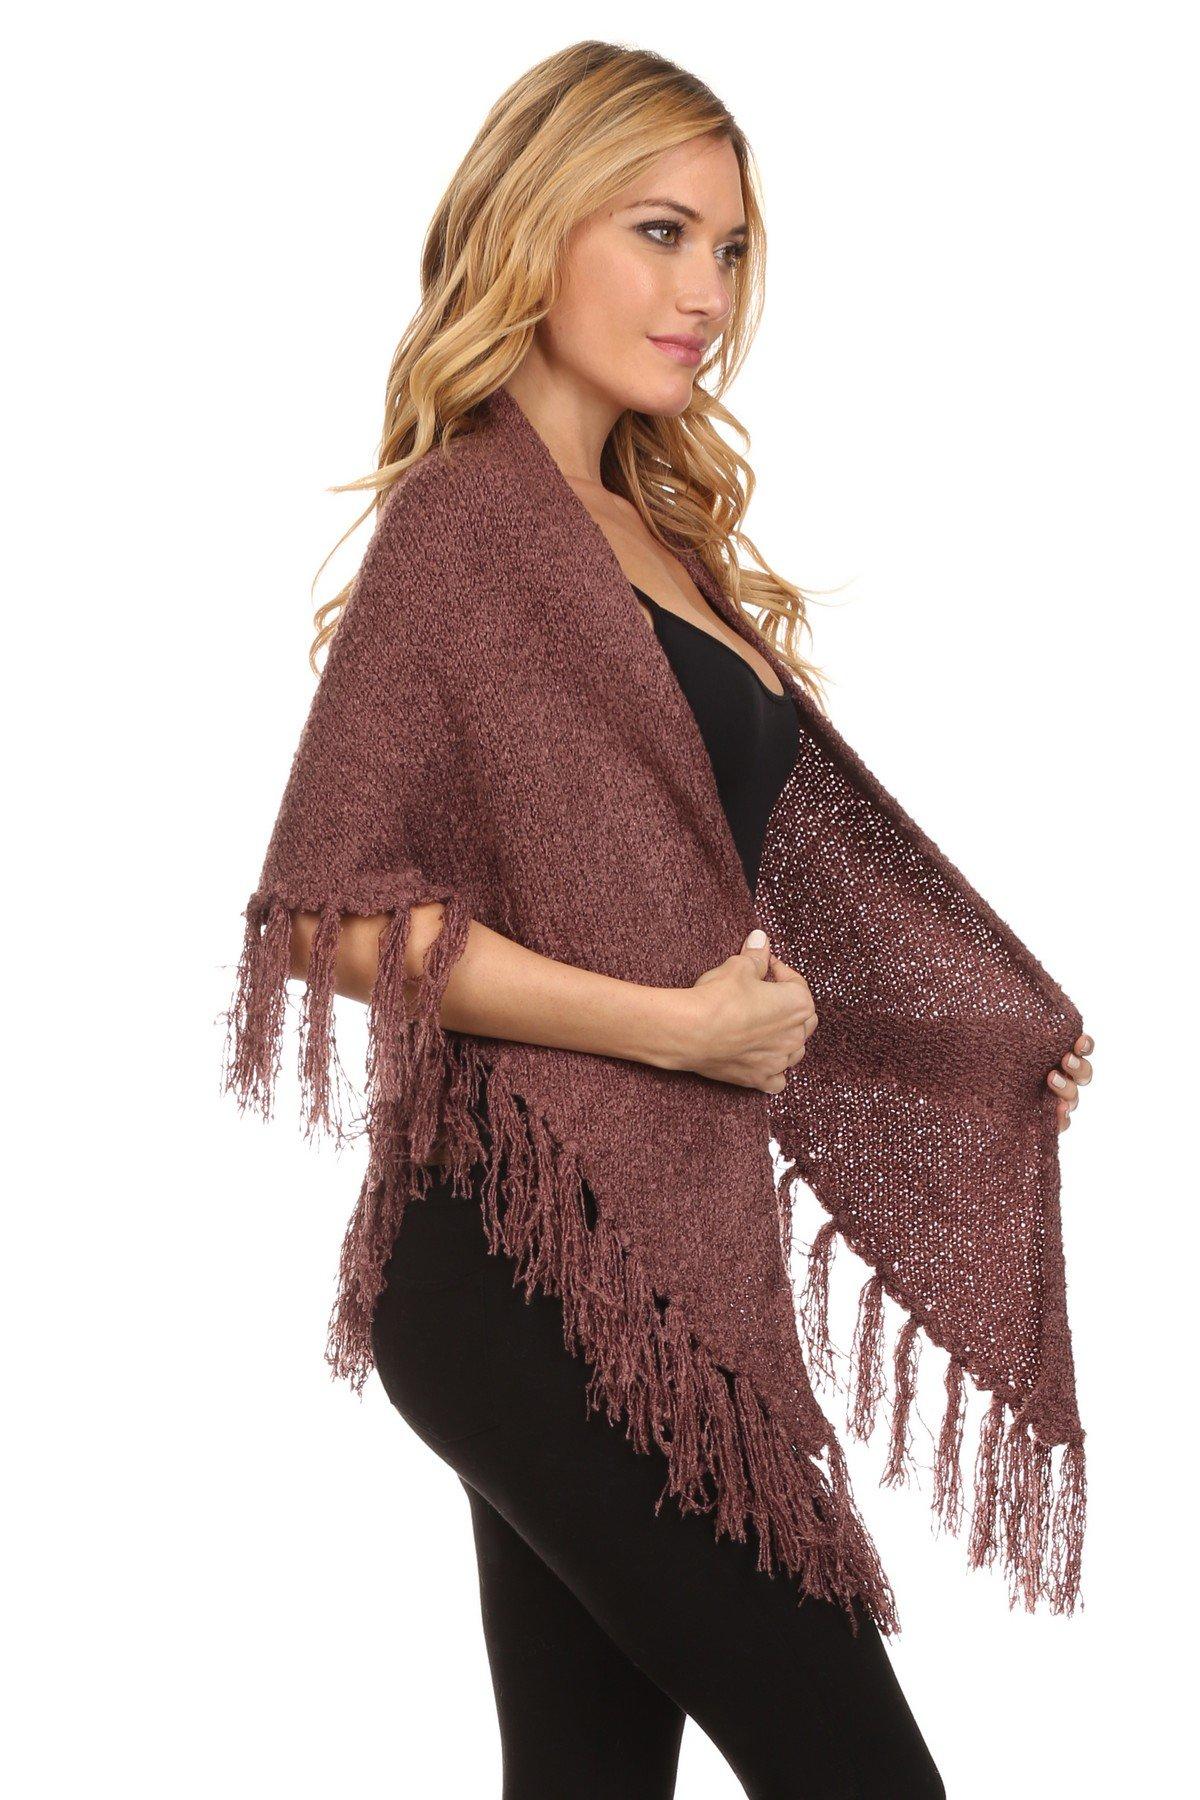 ICONOFLASH Women's Casual Sweater Knit Fringed Fashion Scarf Wrap, Mauve by ICONOFLASH (Image #3)